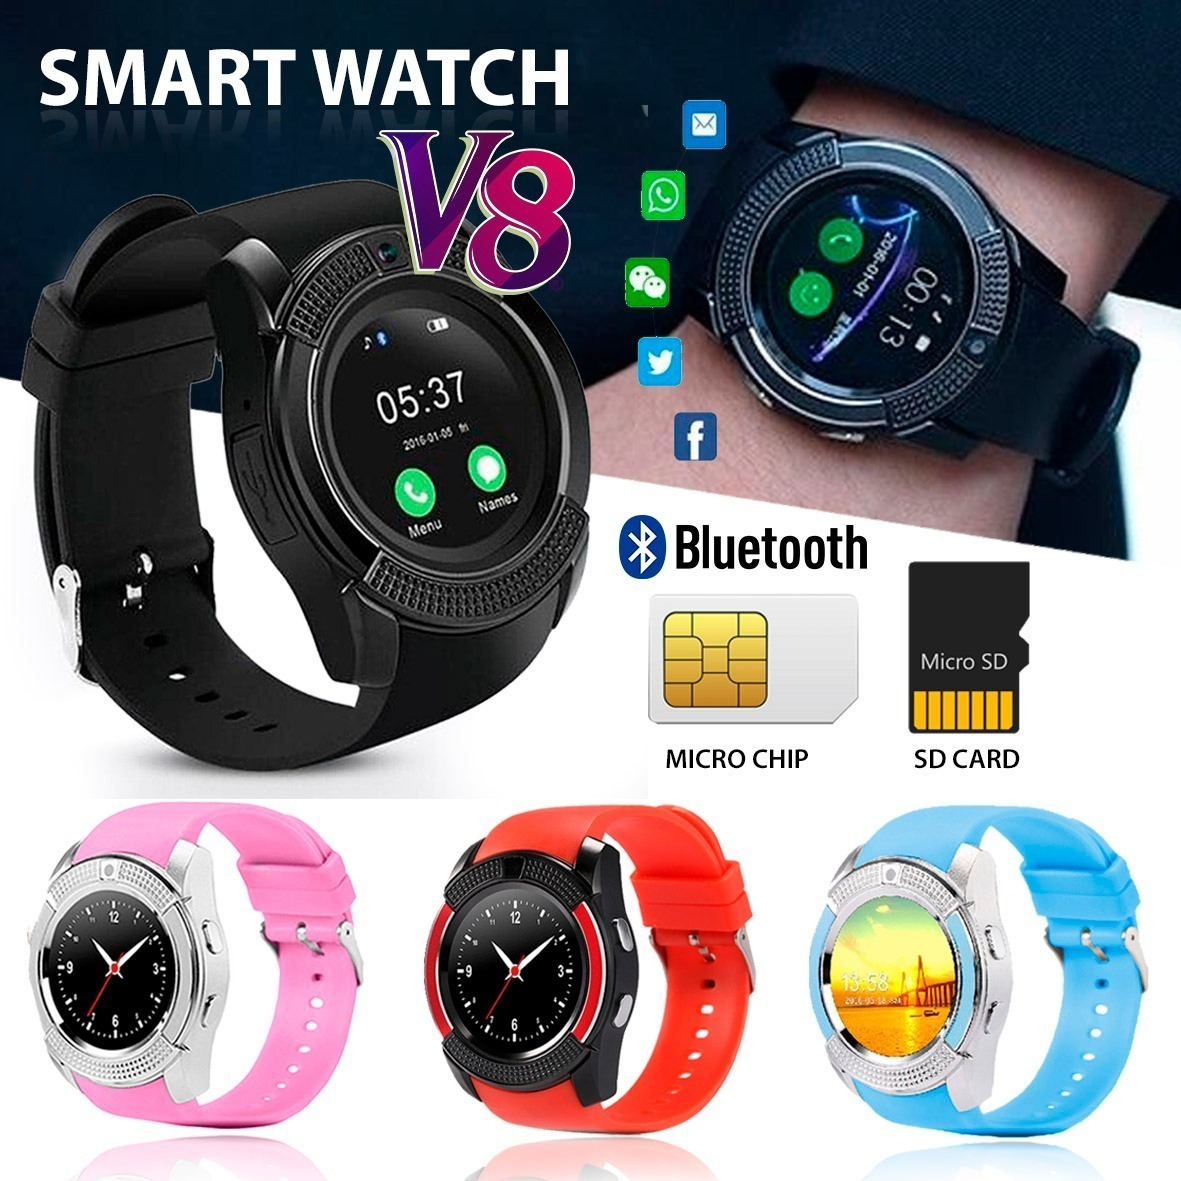 4cd5640da65 ... WATCHRelogio Inteligente Smartwatch V8 Android Ios Bluetooth Chip. 🔍.  SMART WATCH